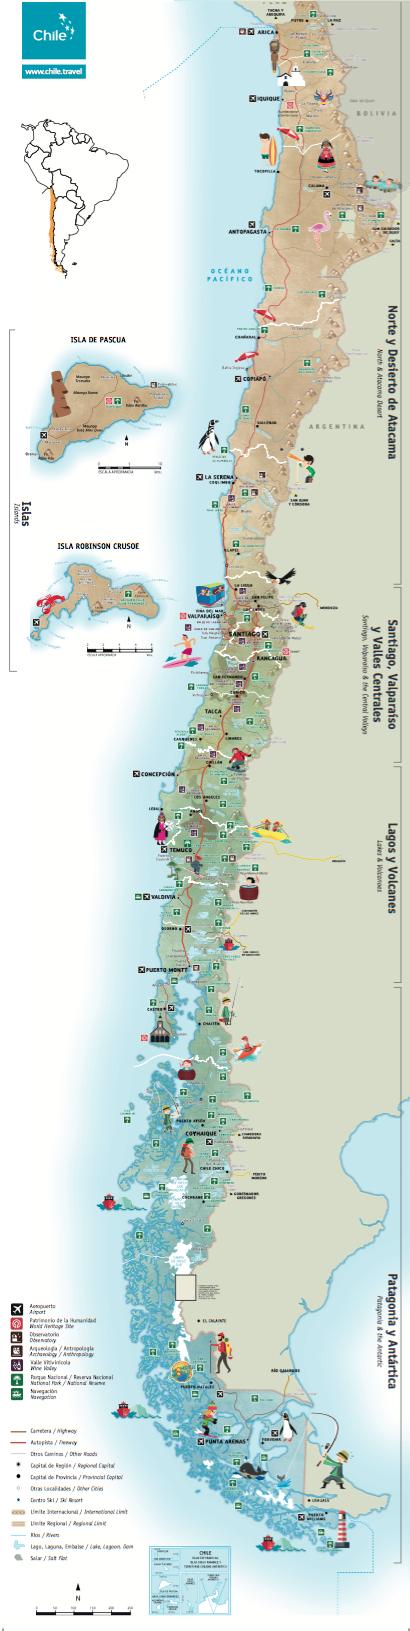 mapa_de_chile